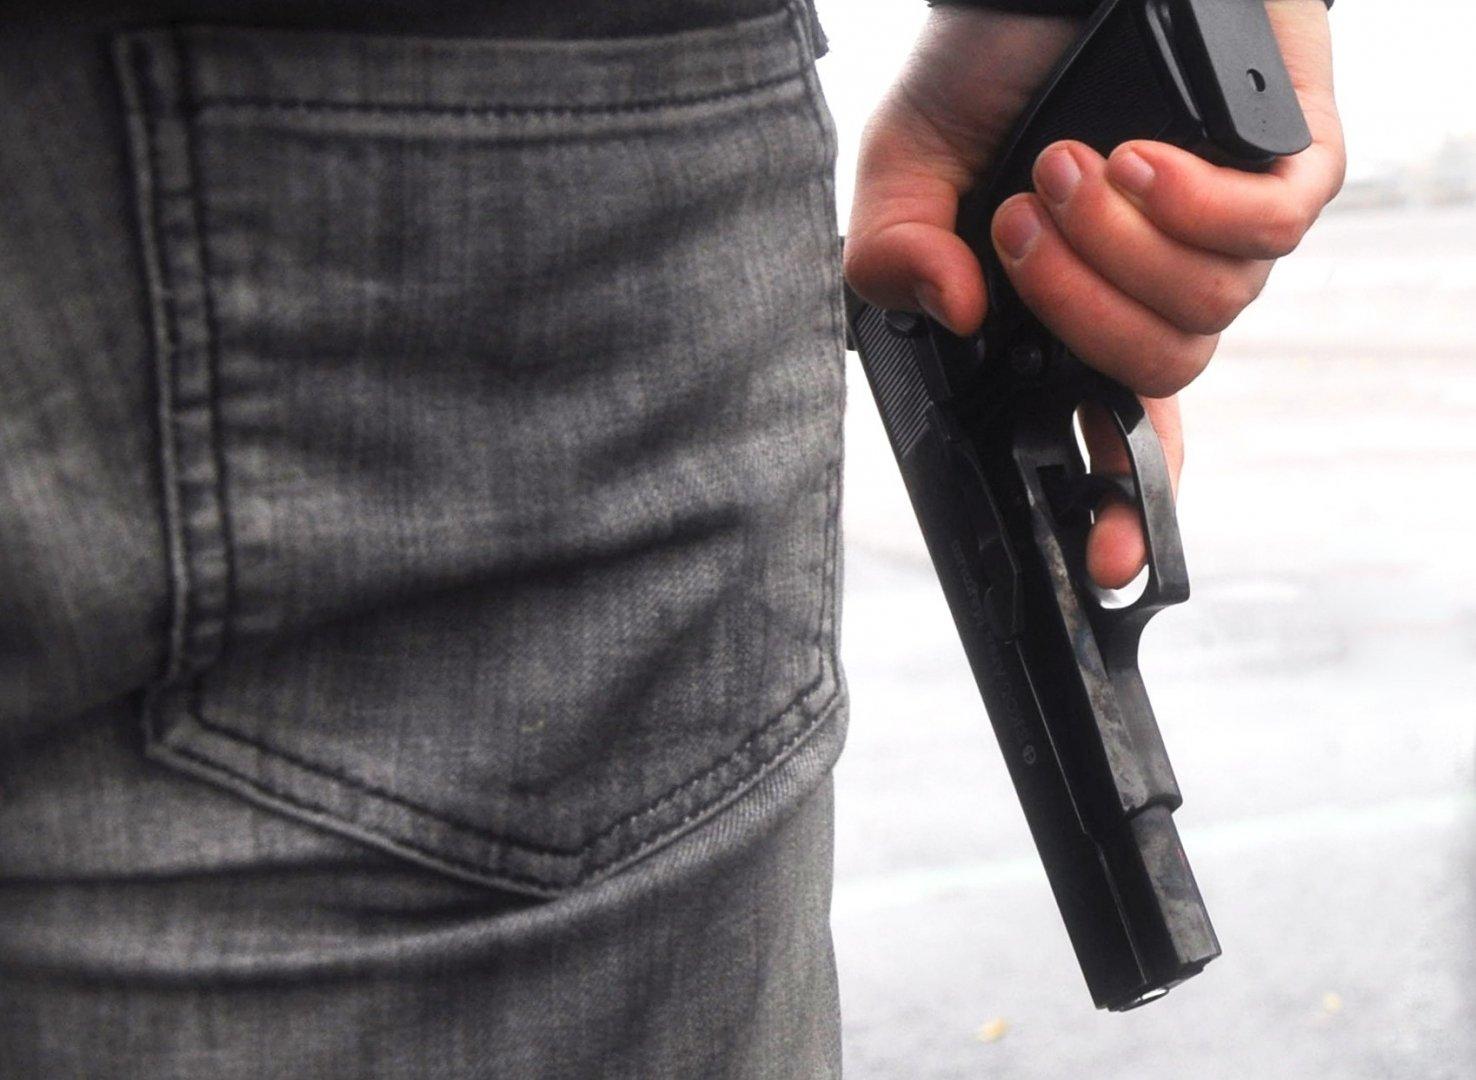 НаФилиппинах снайпер застрелил мэра города Танаван вовремя церемонии поднятия флага